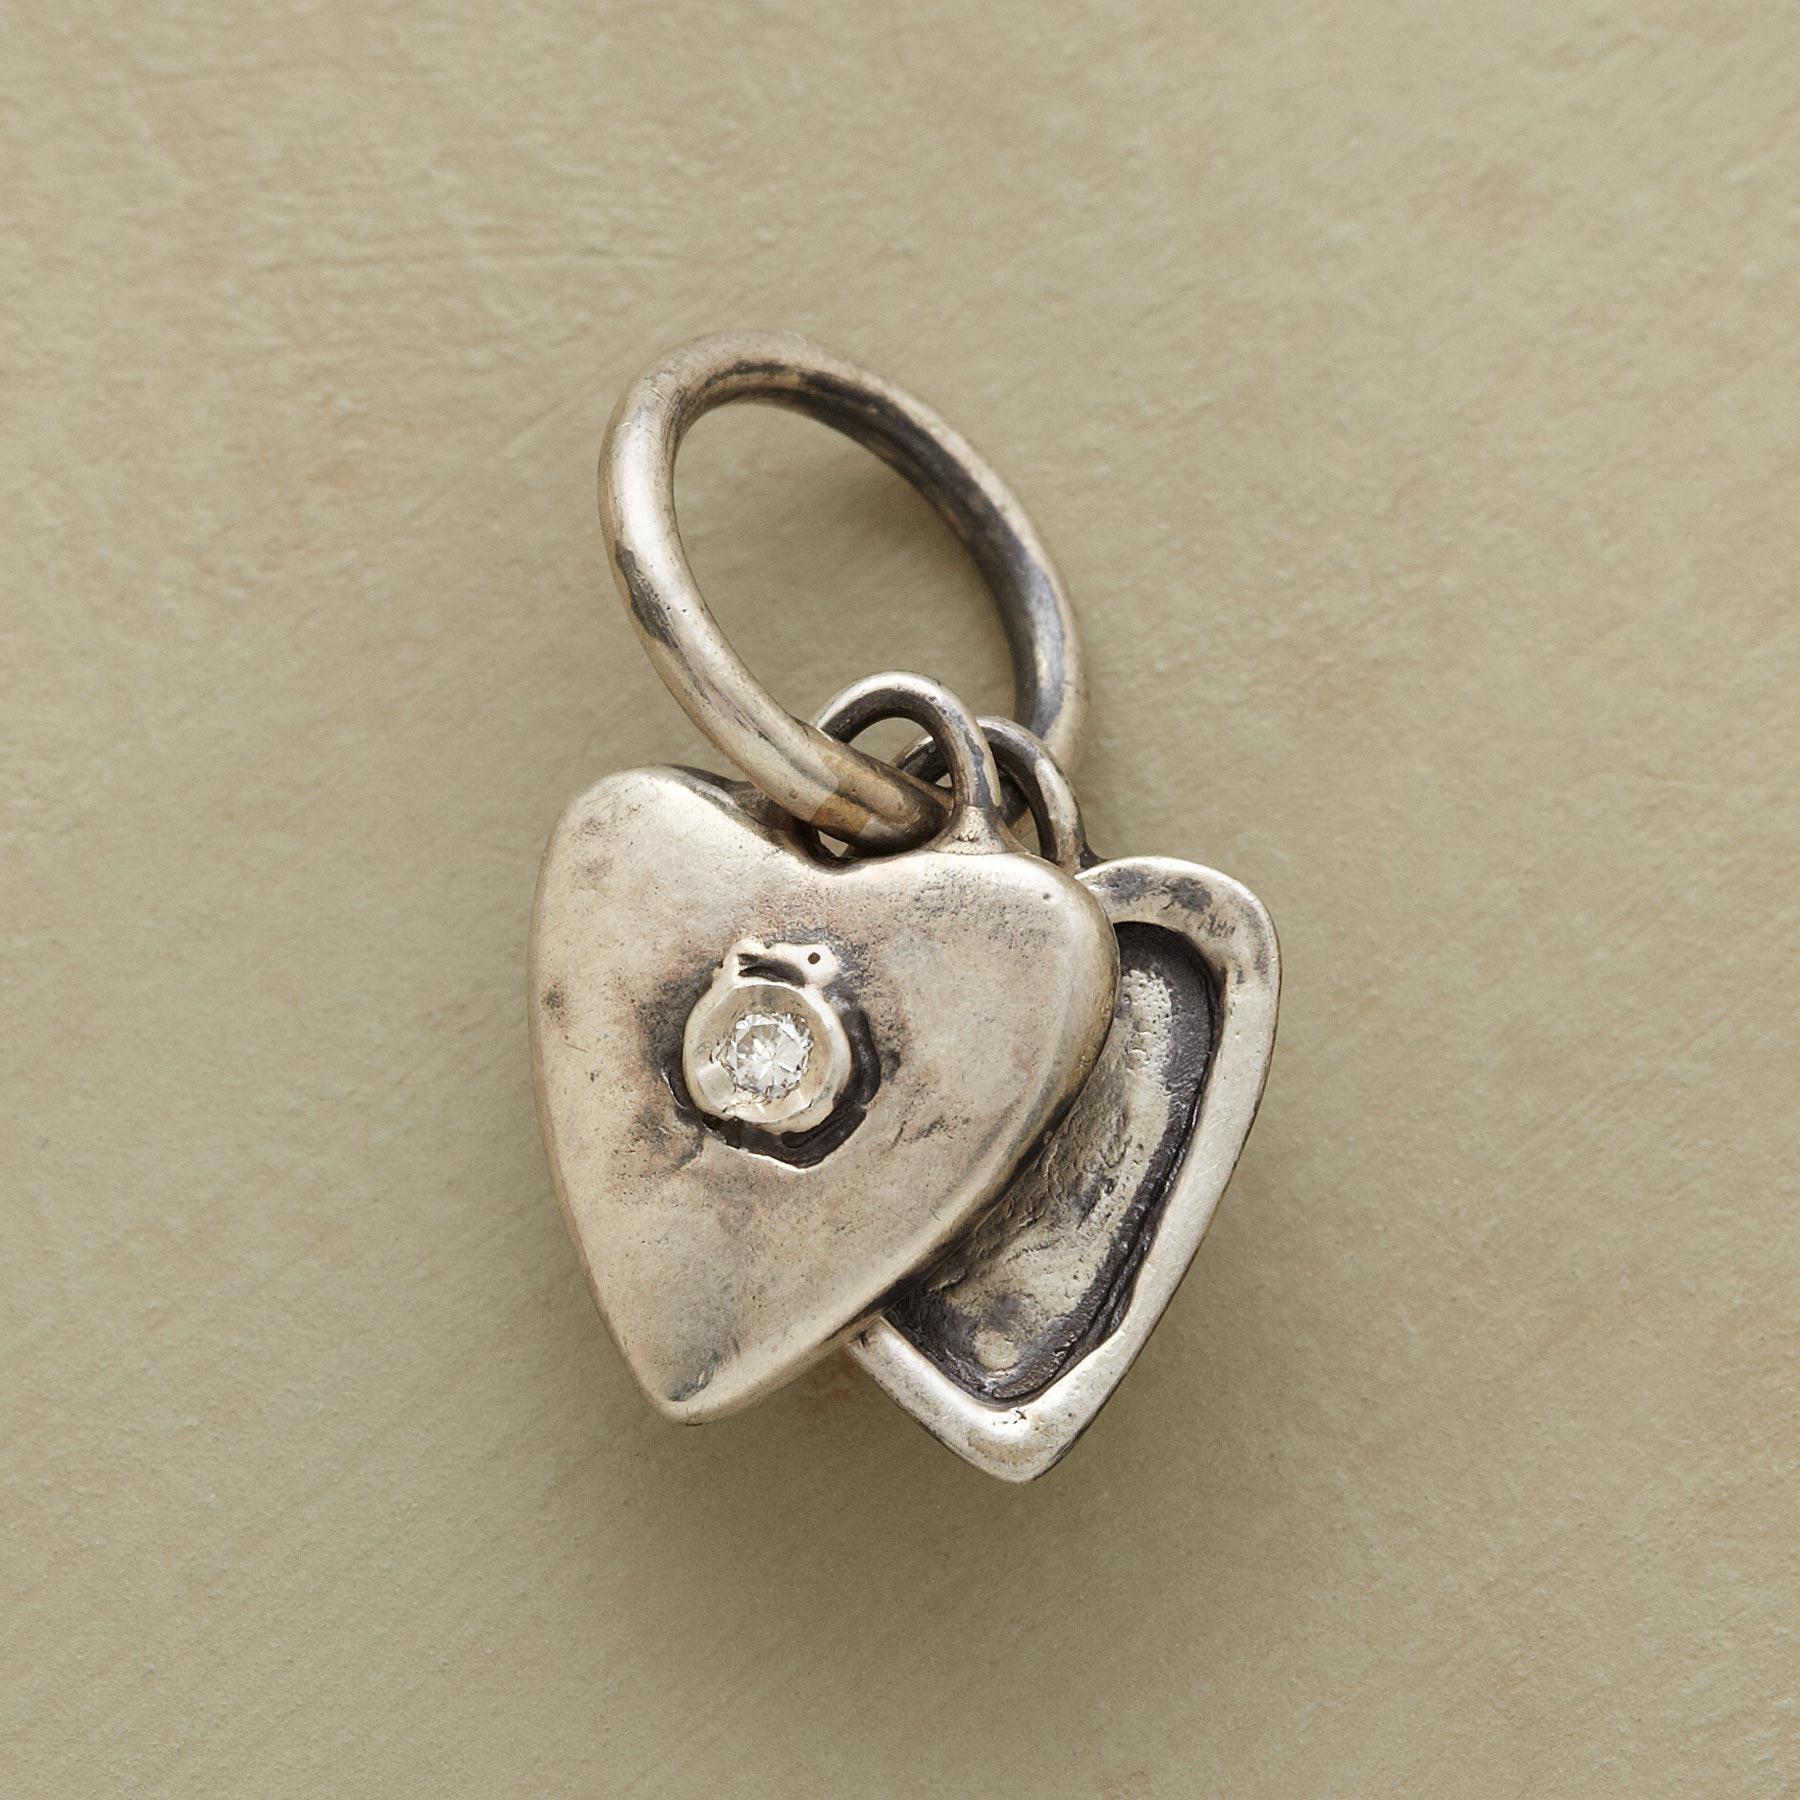 Silver Heart Locket Charm